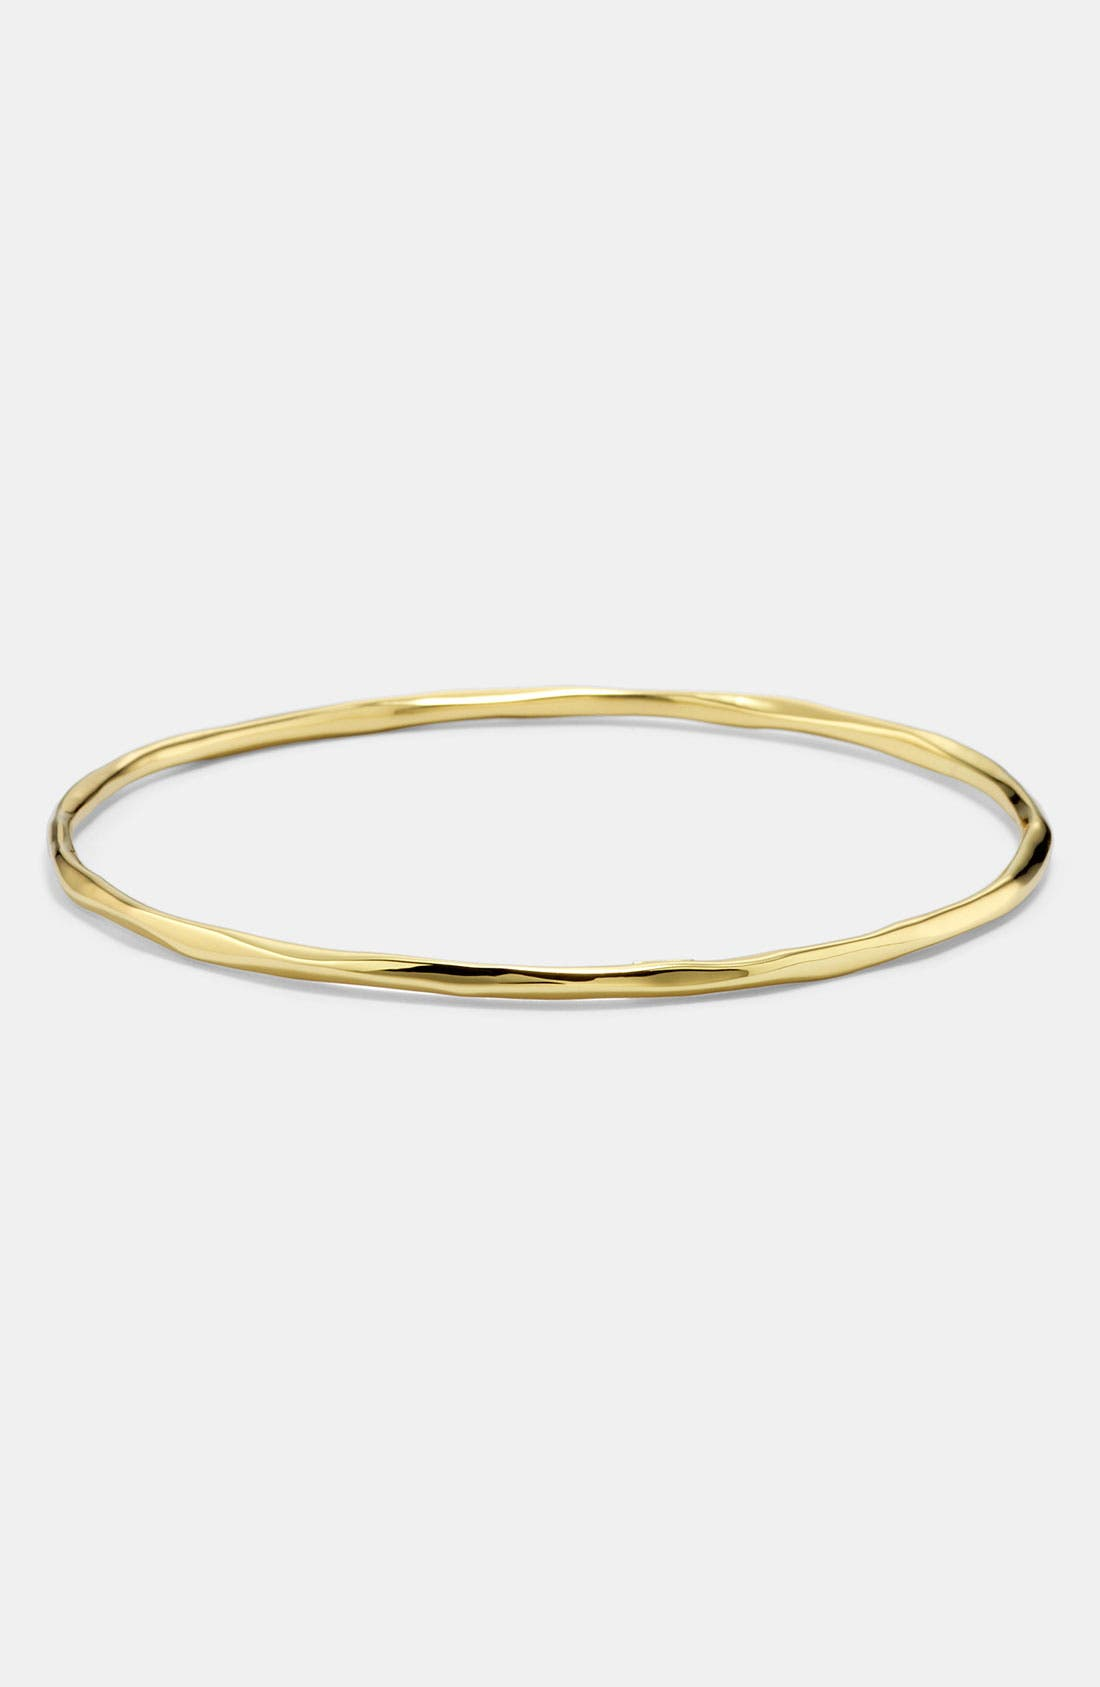 Main Image - Ippolita 'Glamazon' Faceted 18k Gold Bangle